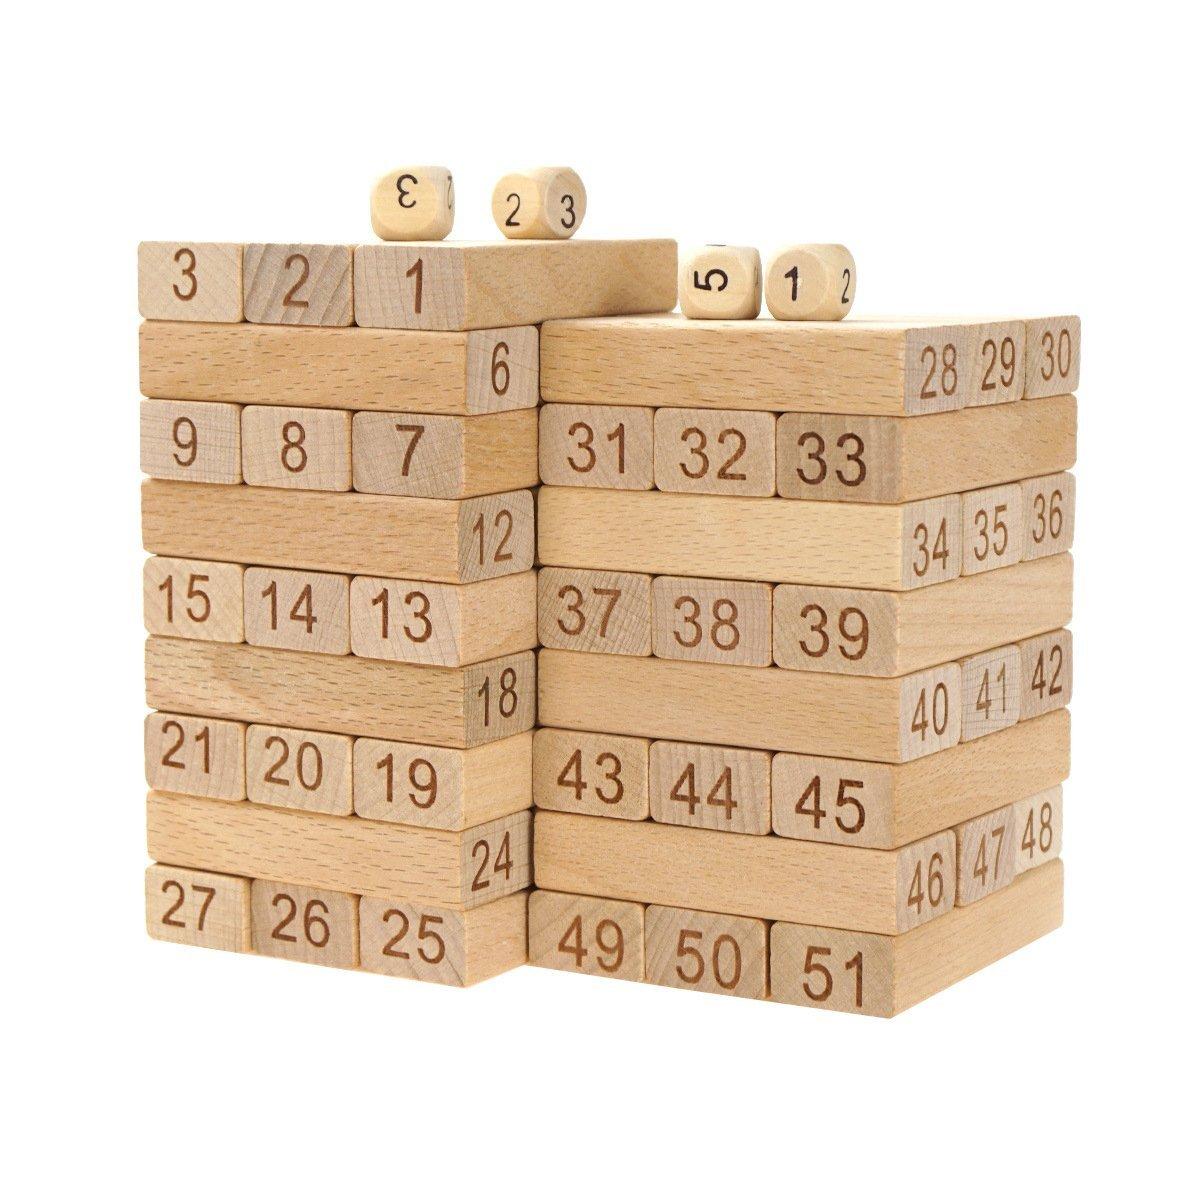 Greencherry Intelligence Development Wood Block Toy Stacking Blocks.